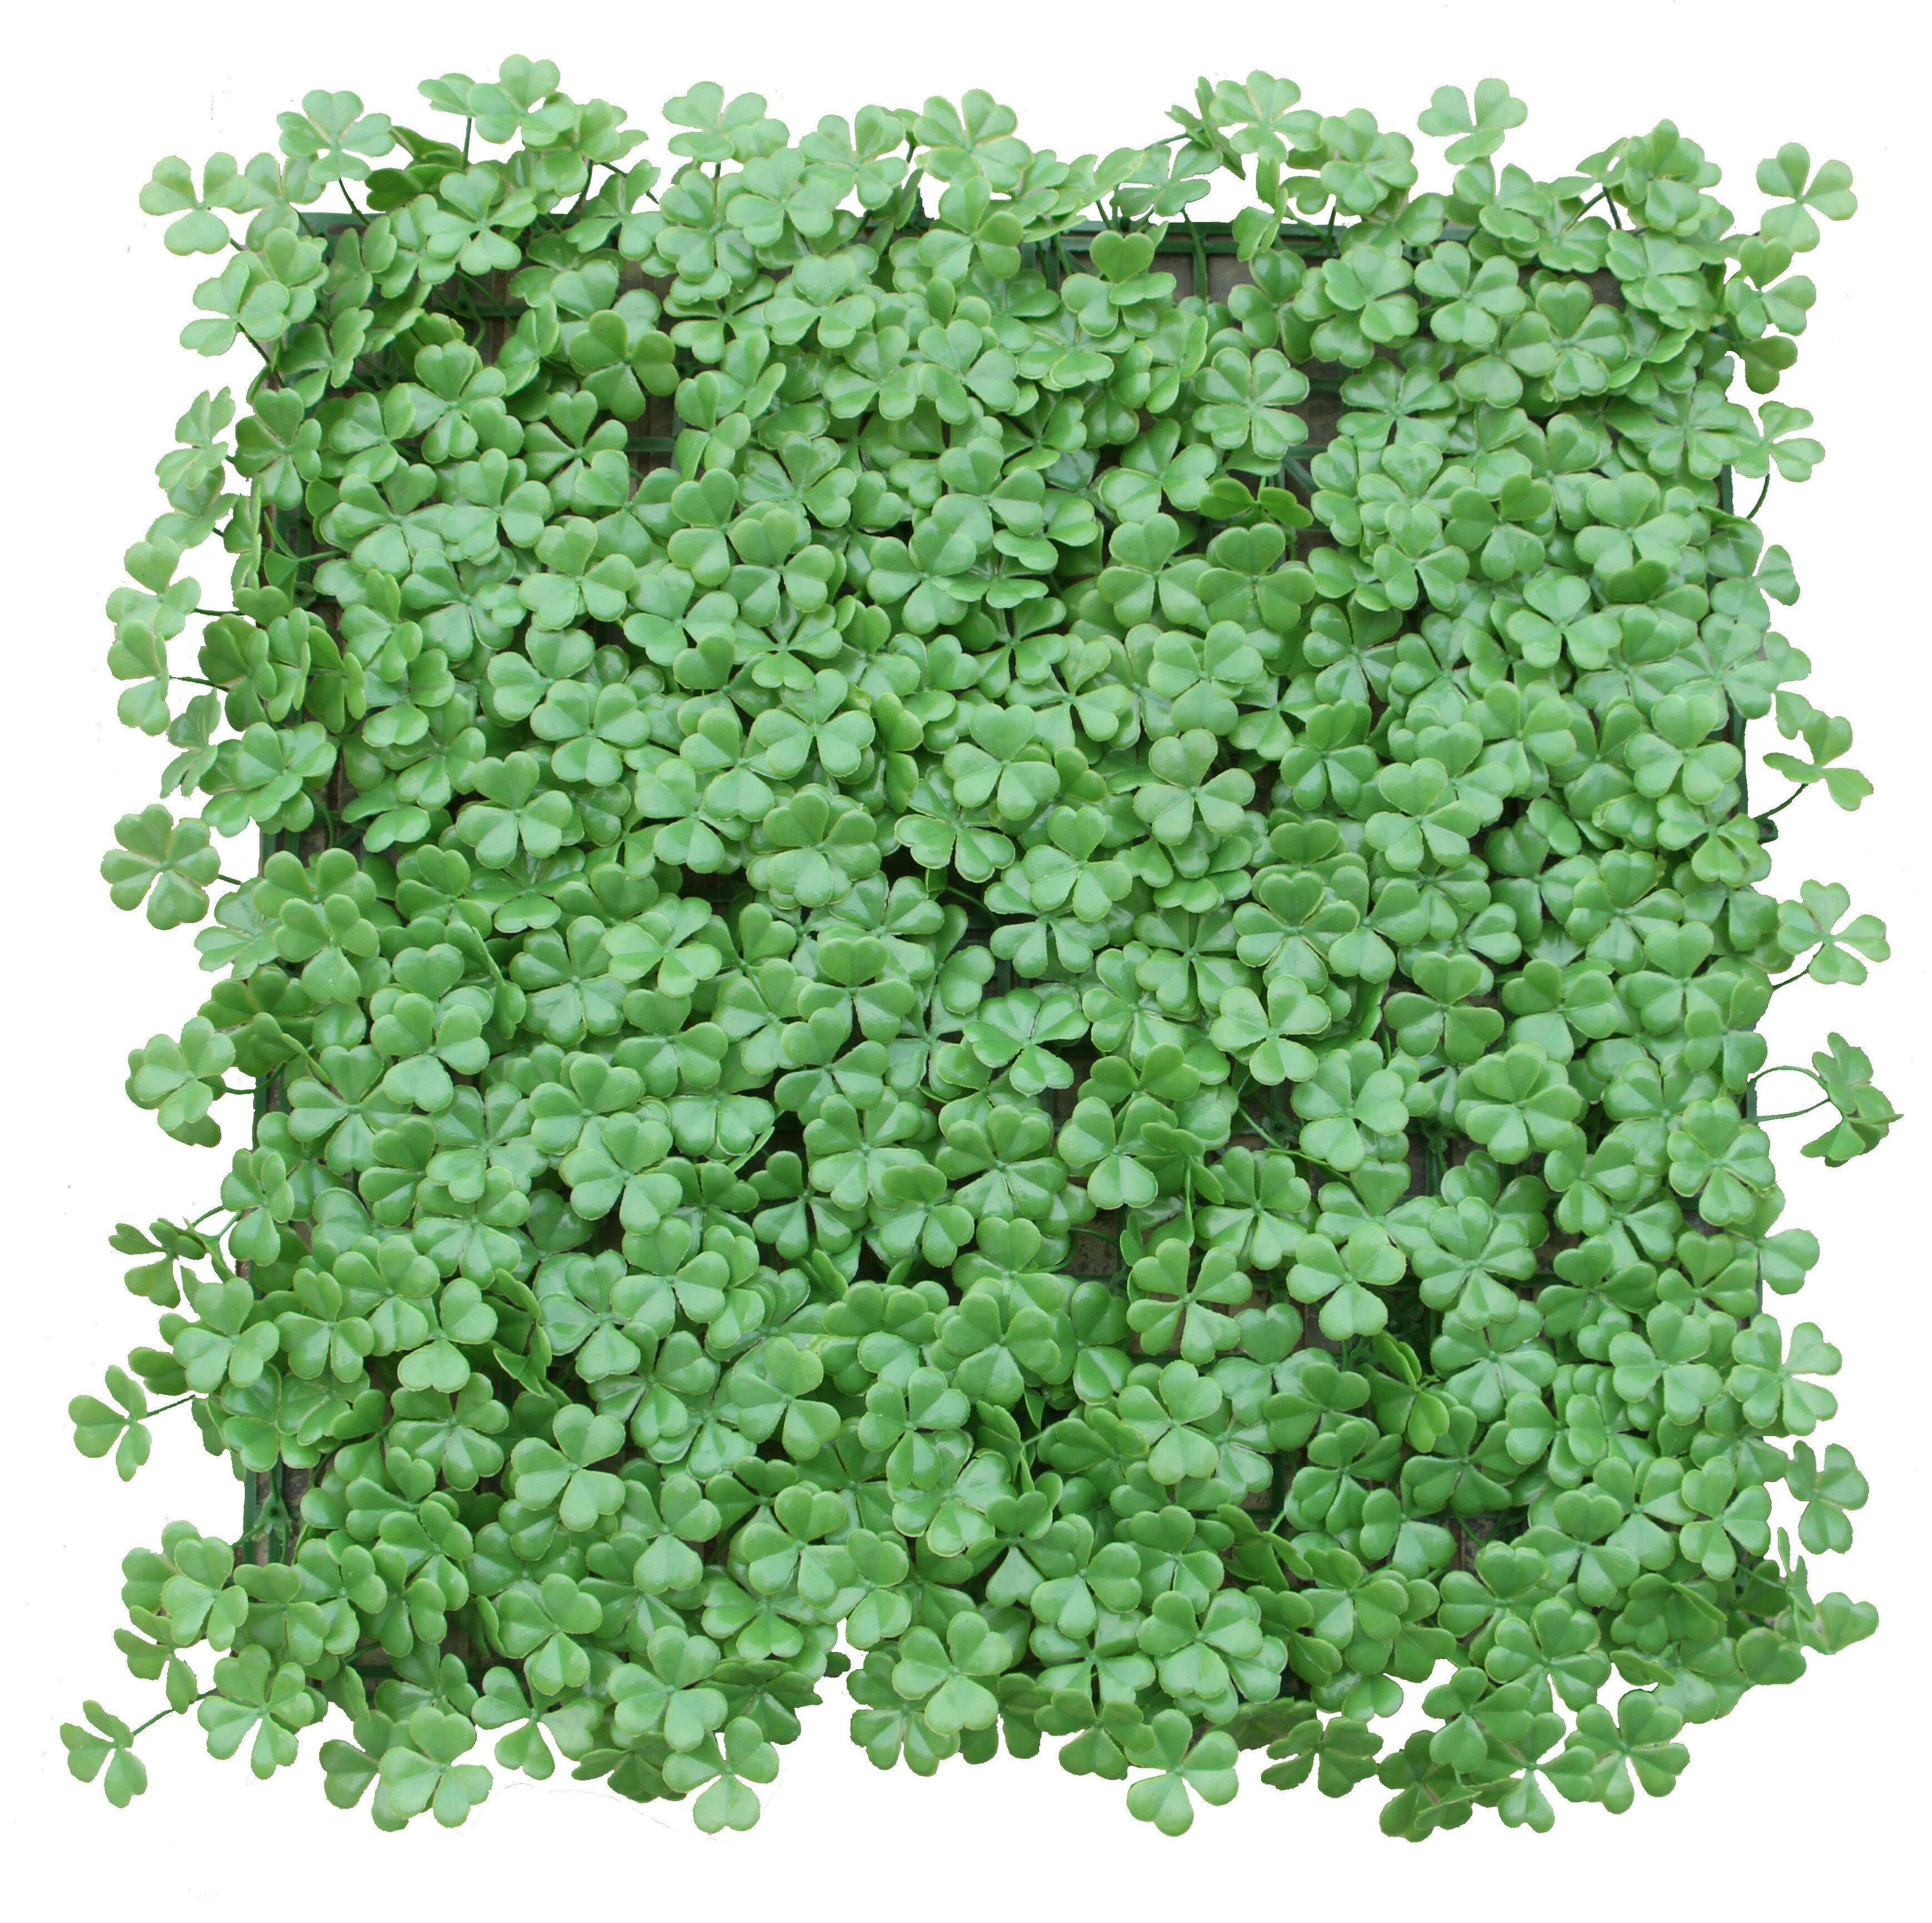 E Joy 1 7 Ft H X 1 7 Ft Wartificial Topiary Hedge Plant Artificalhedge Lucky Grass 10box Wayfair